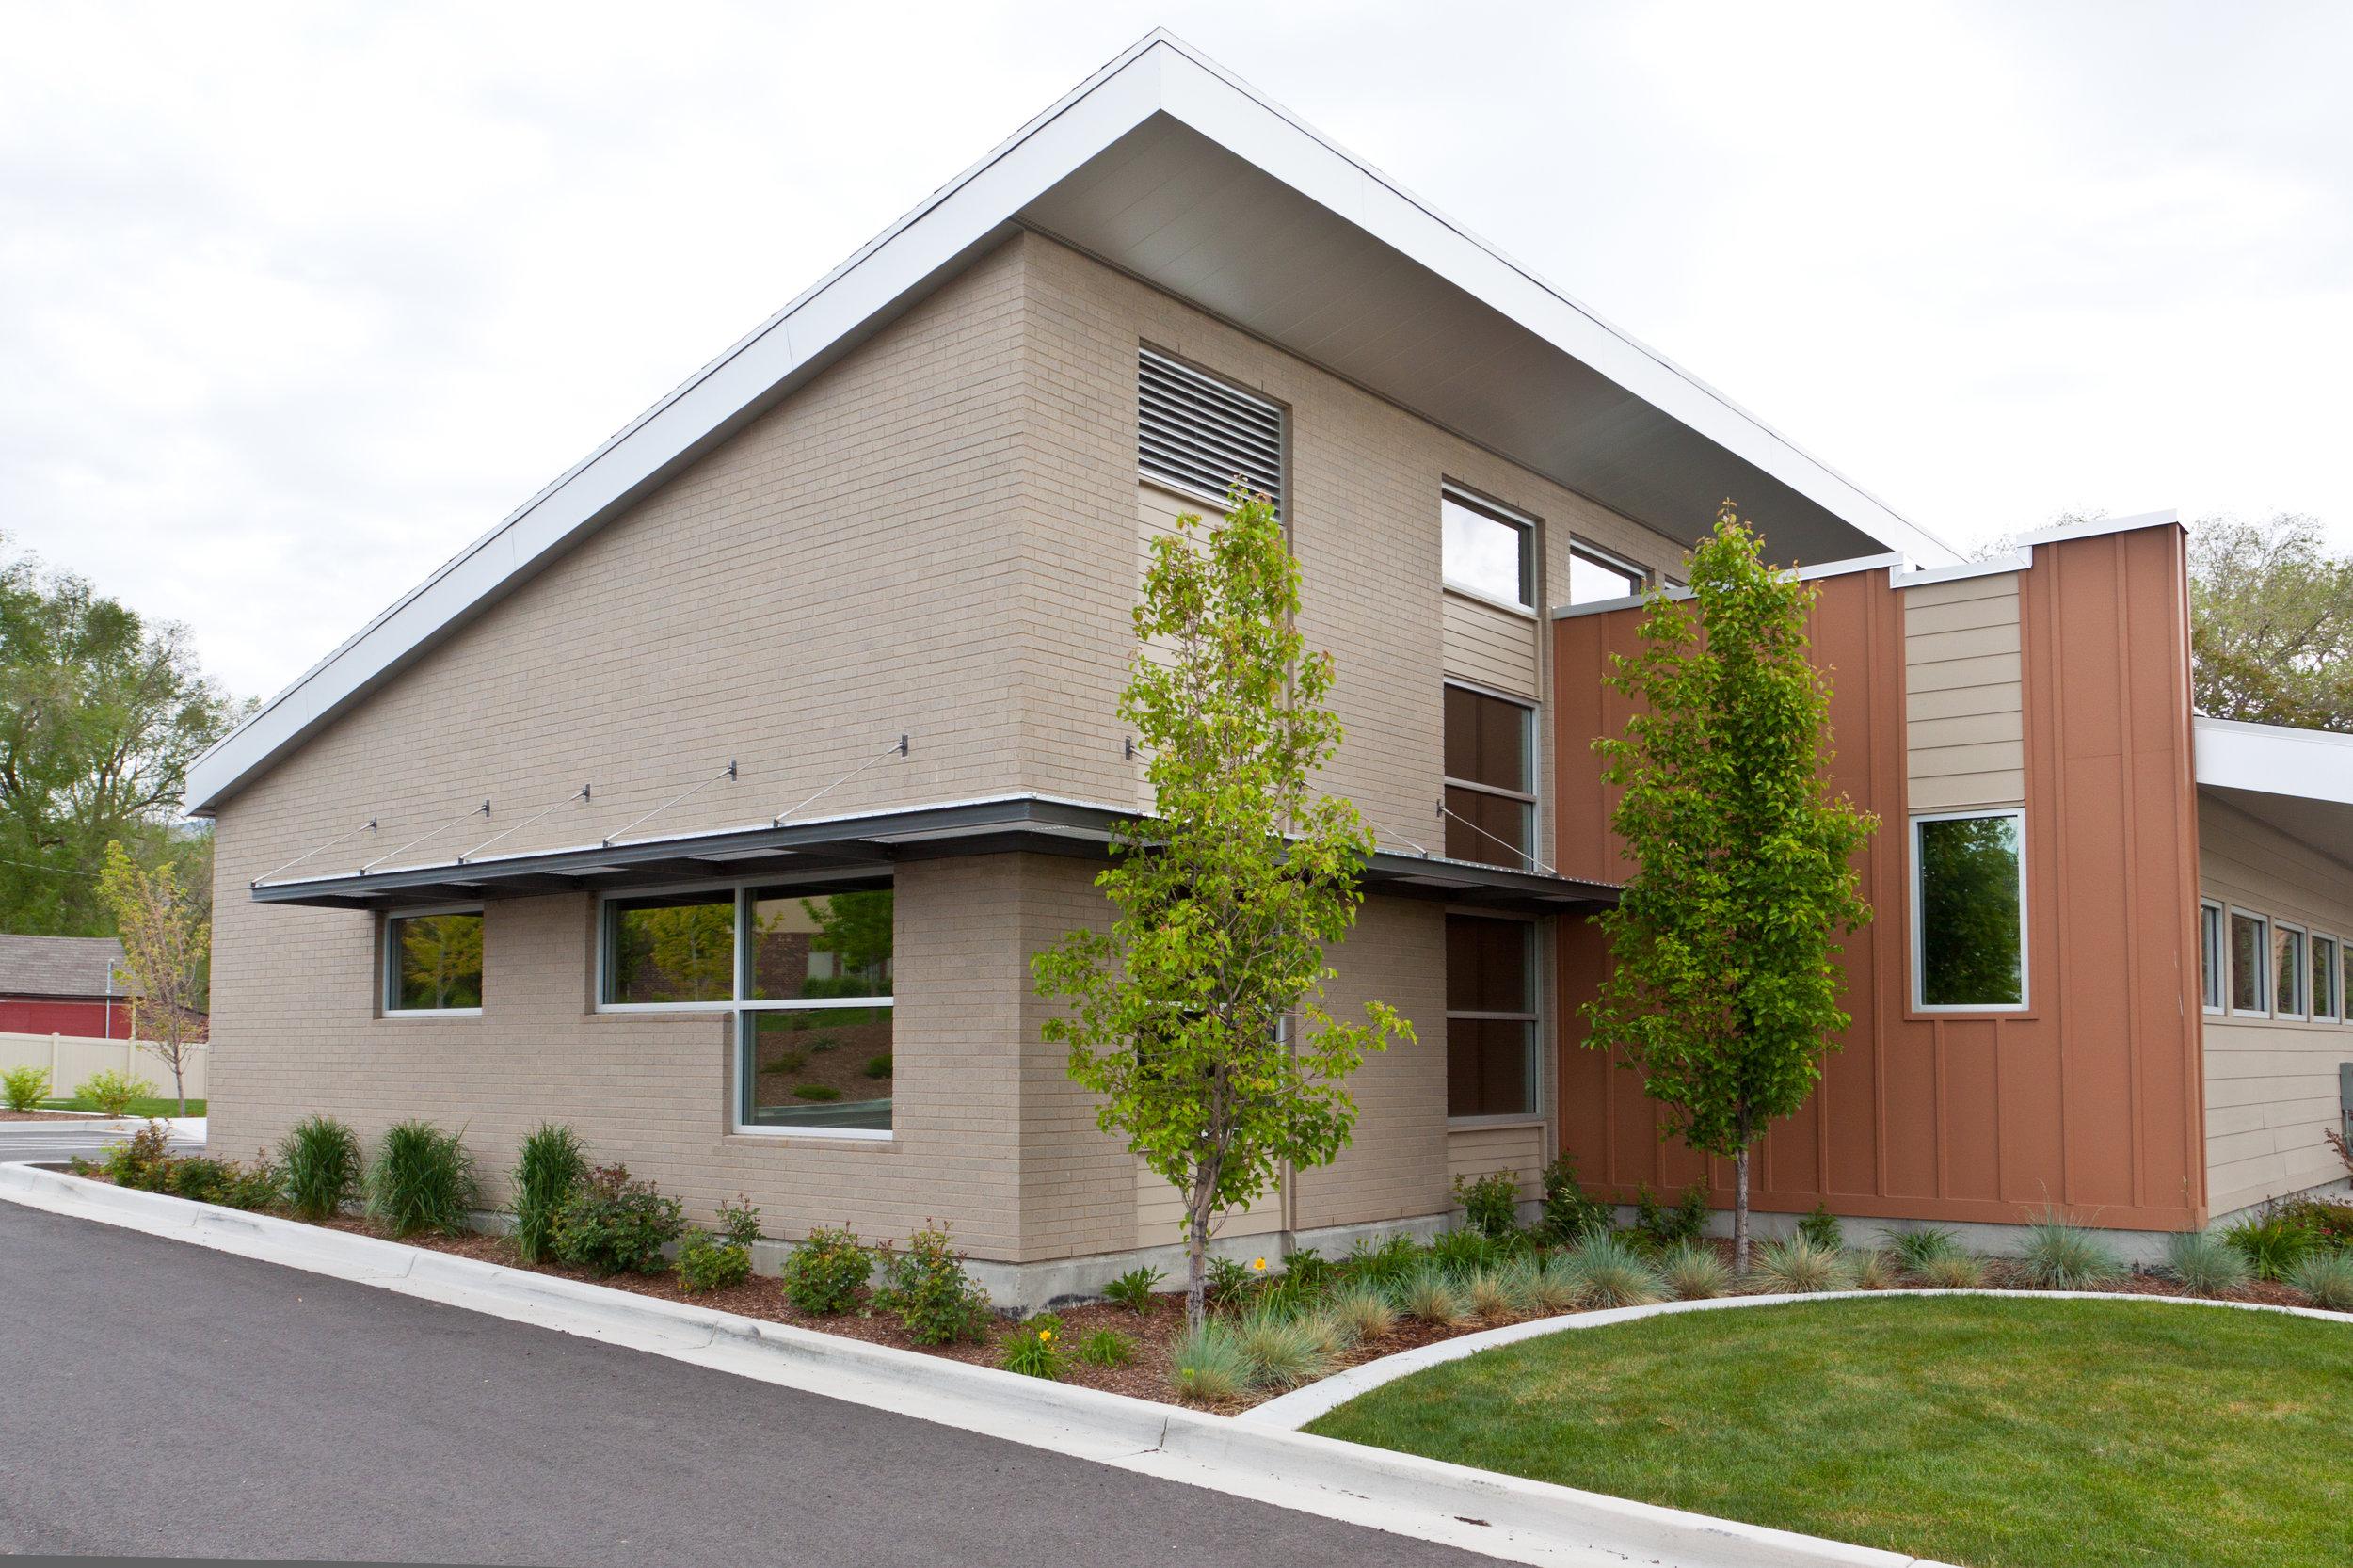 OGDEN HOUSING AUTHORITY OFFICE BUILDING